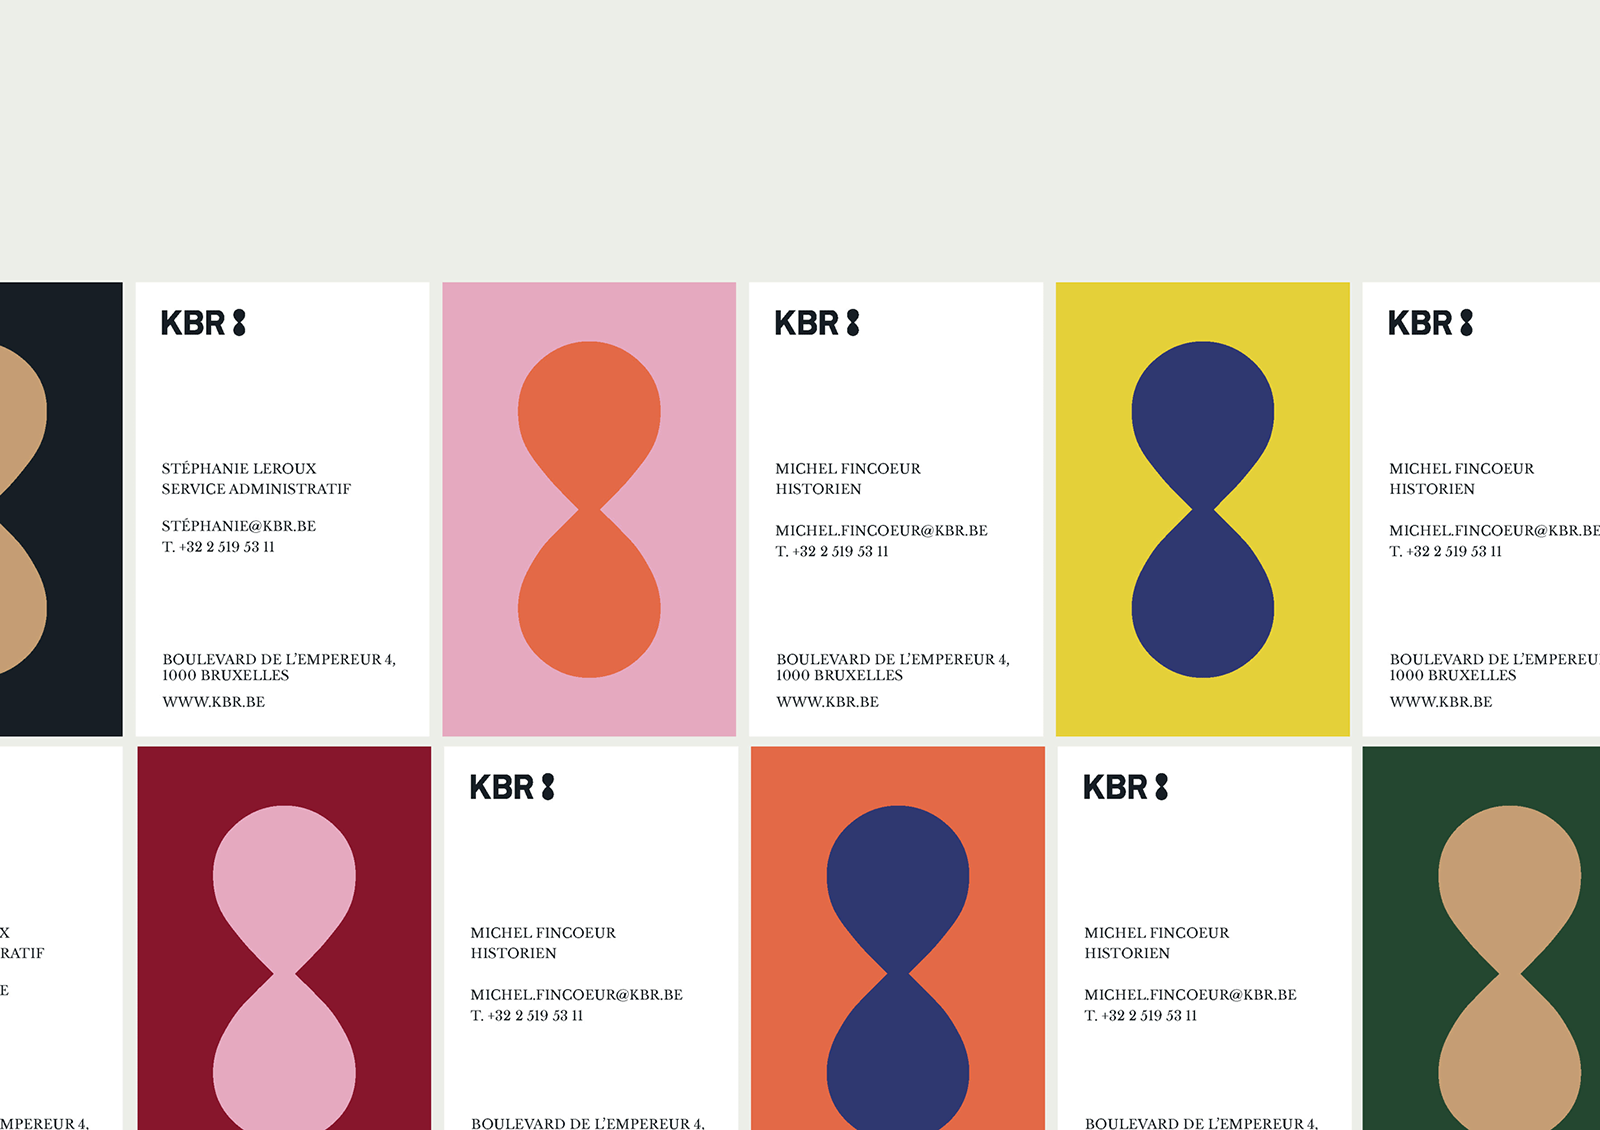 KBR比利时皇家图书馆启用全新的品牌VI形象设计-深圳VI设计7